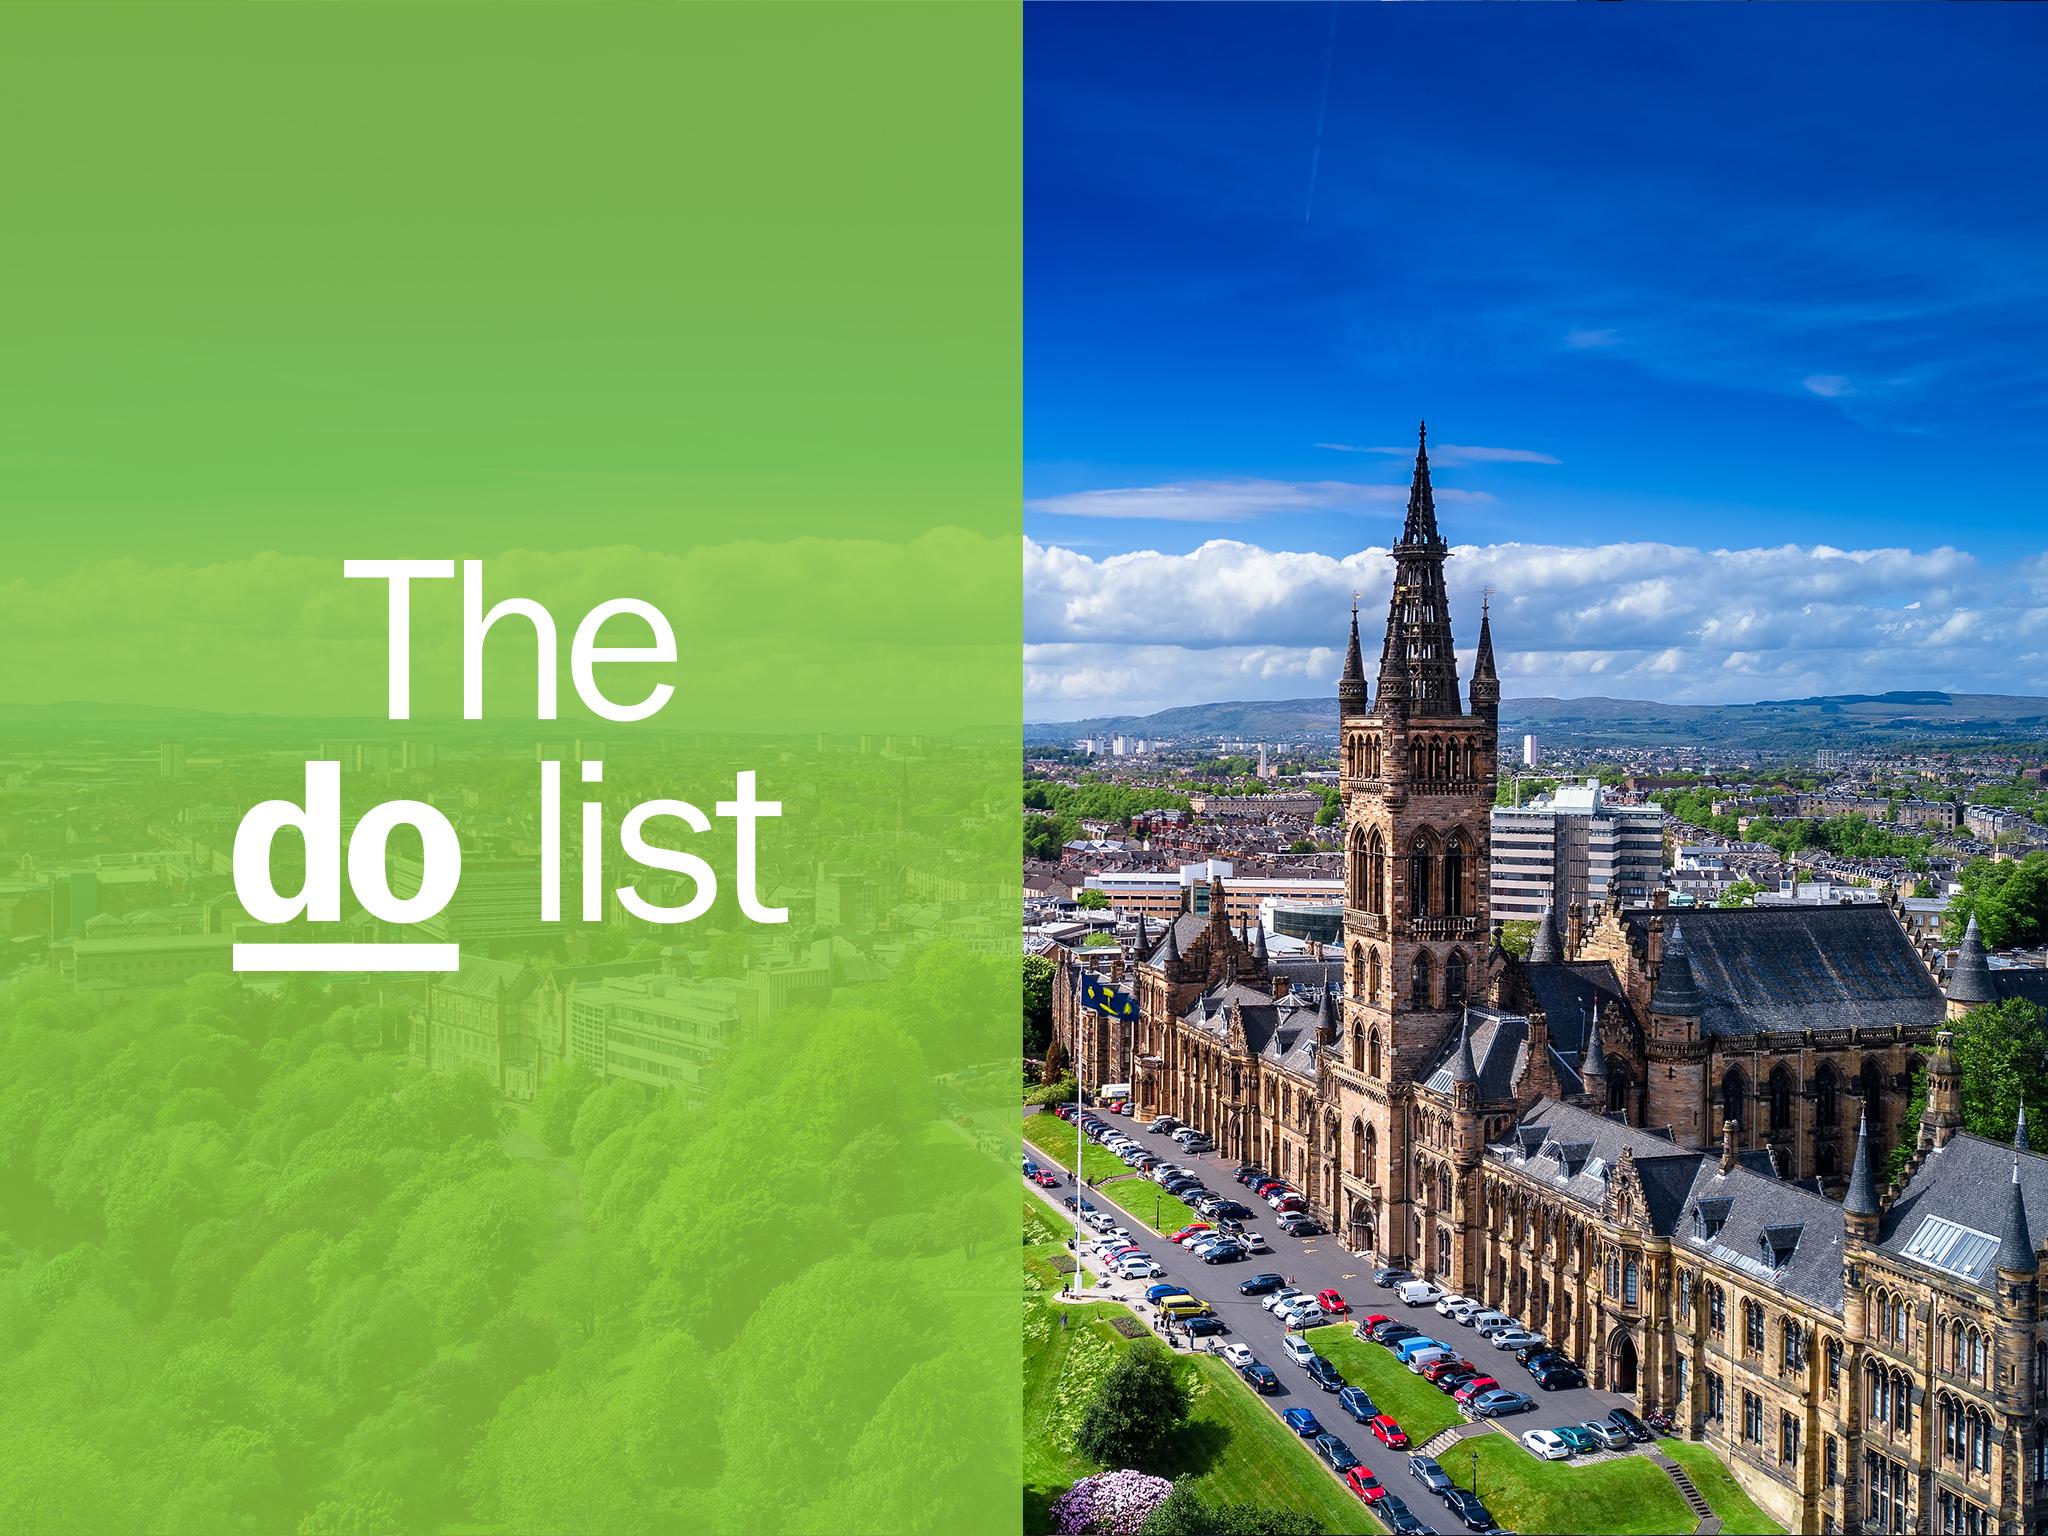 TTD in Glasgow